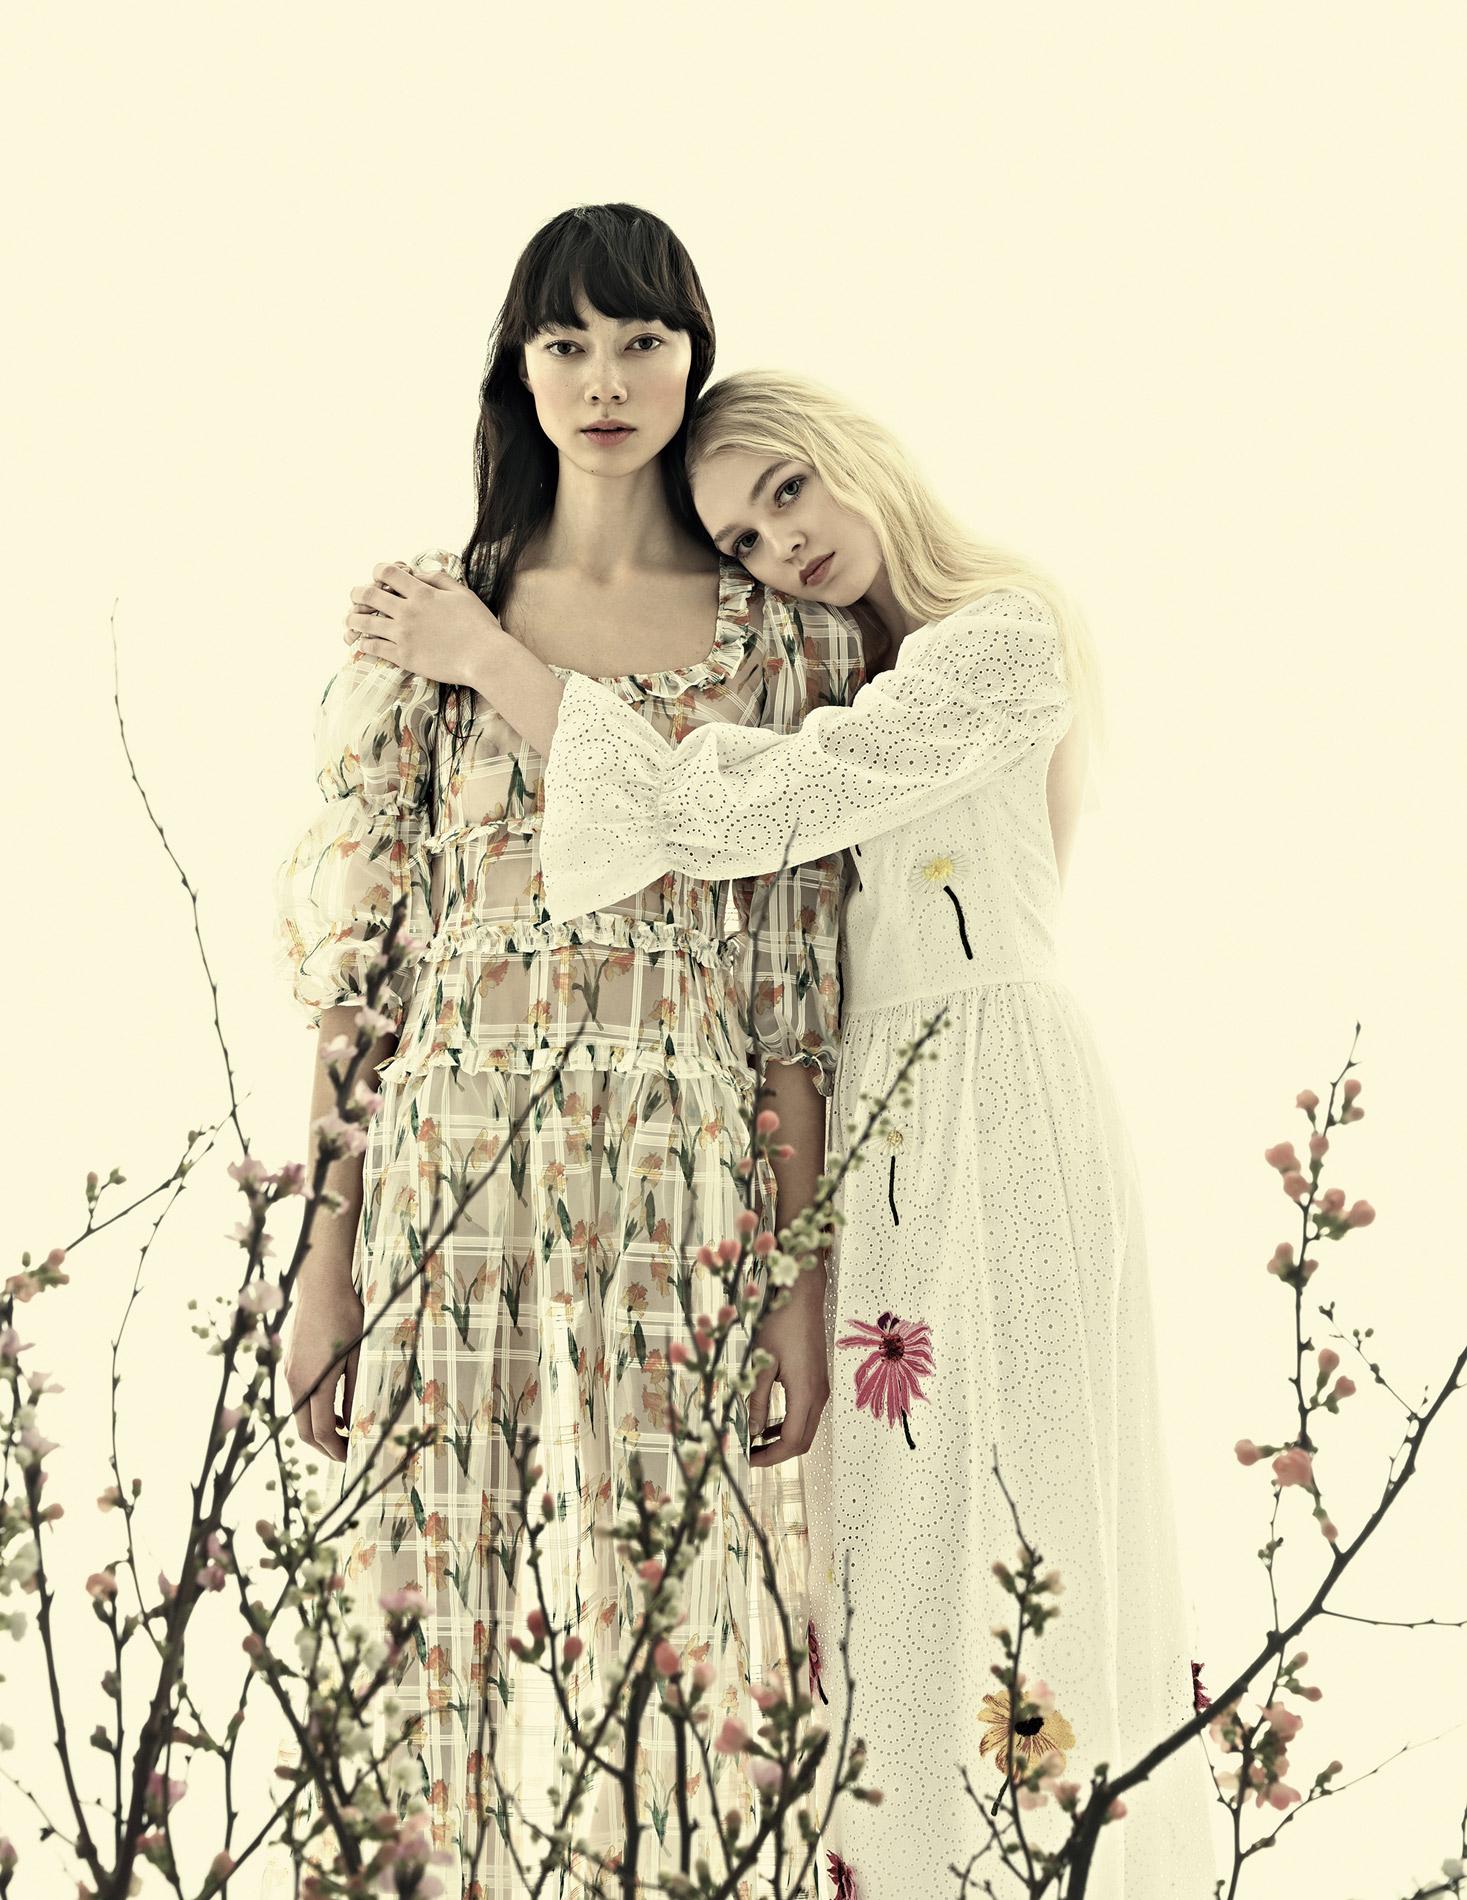 Carl-Bengtsson-for-Brides-March-April-2019-14.jpg